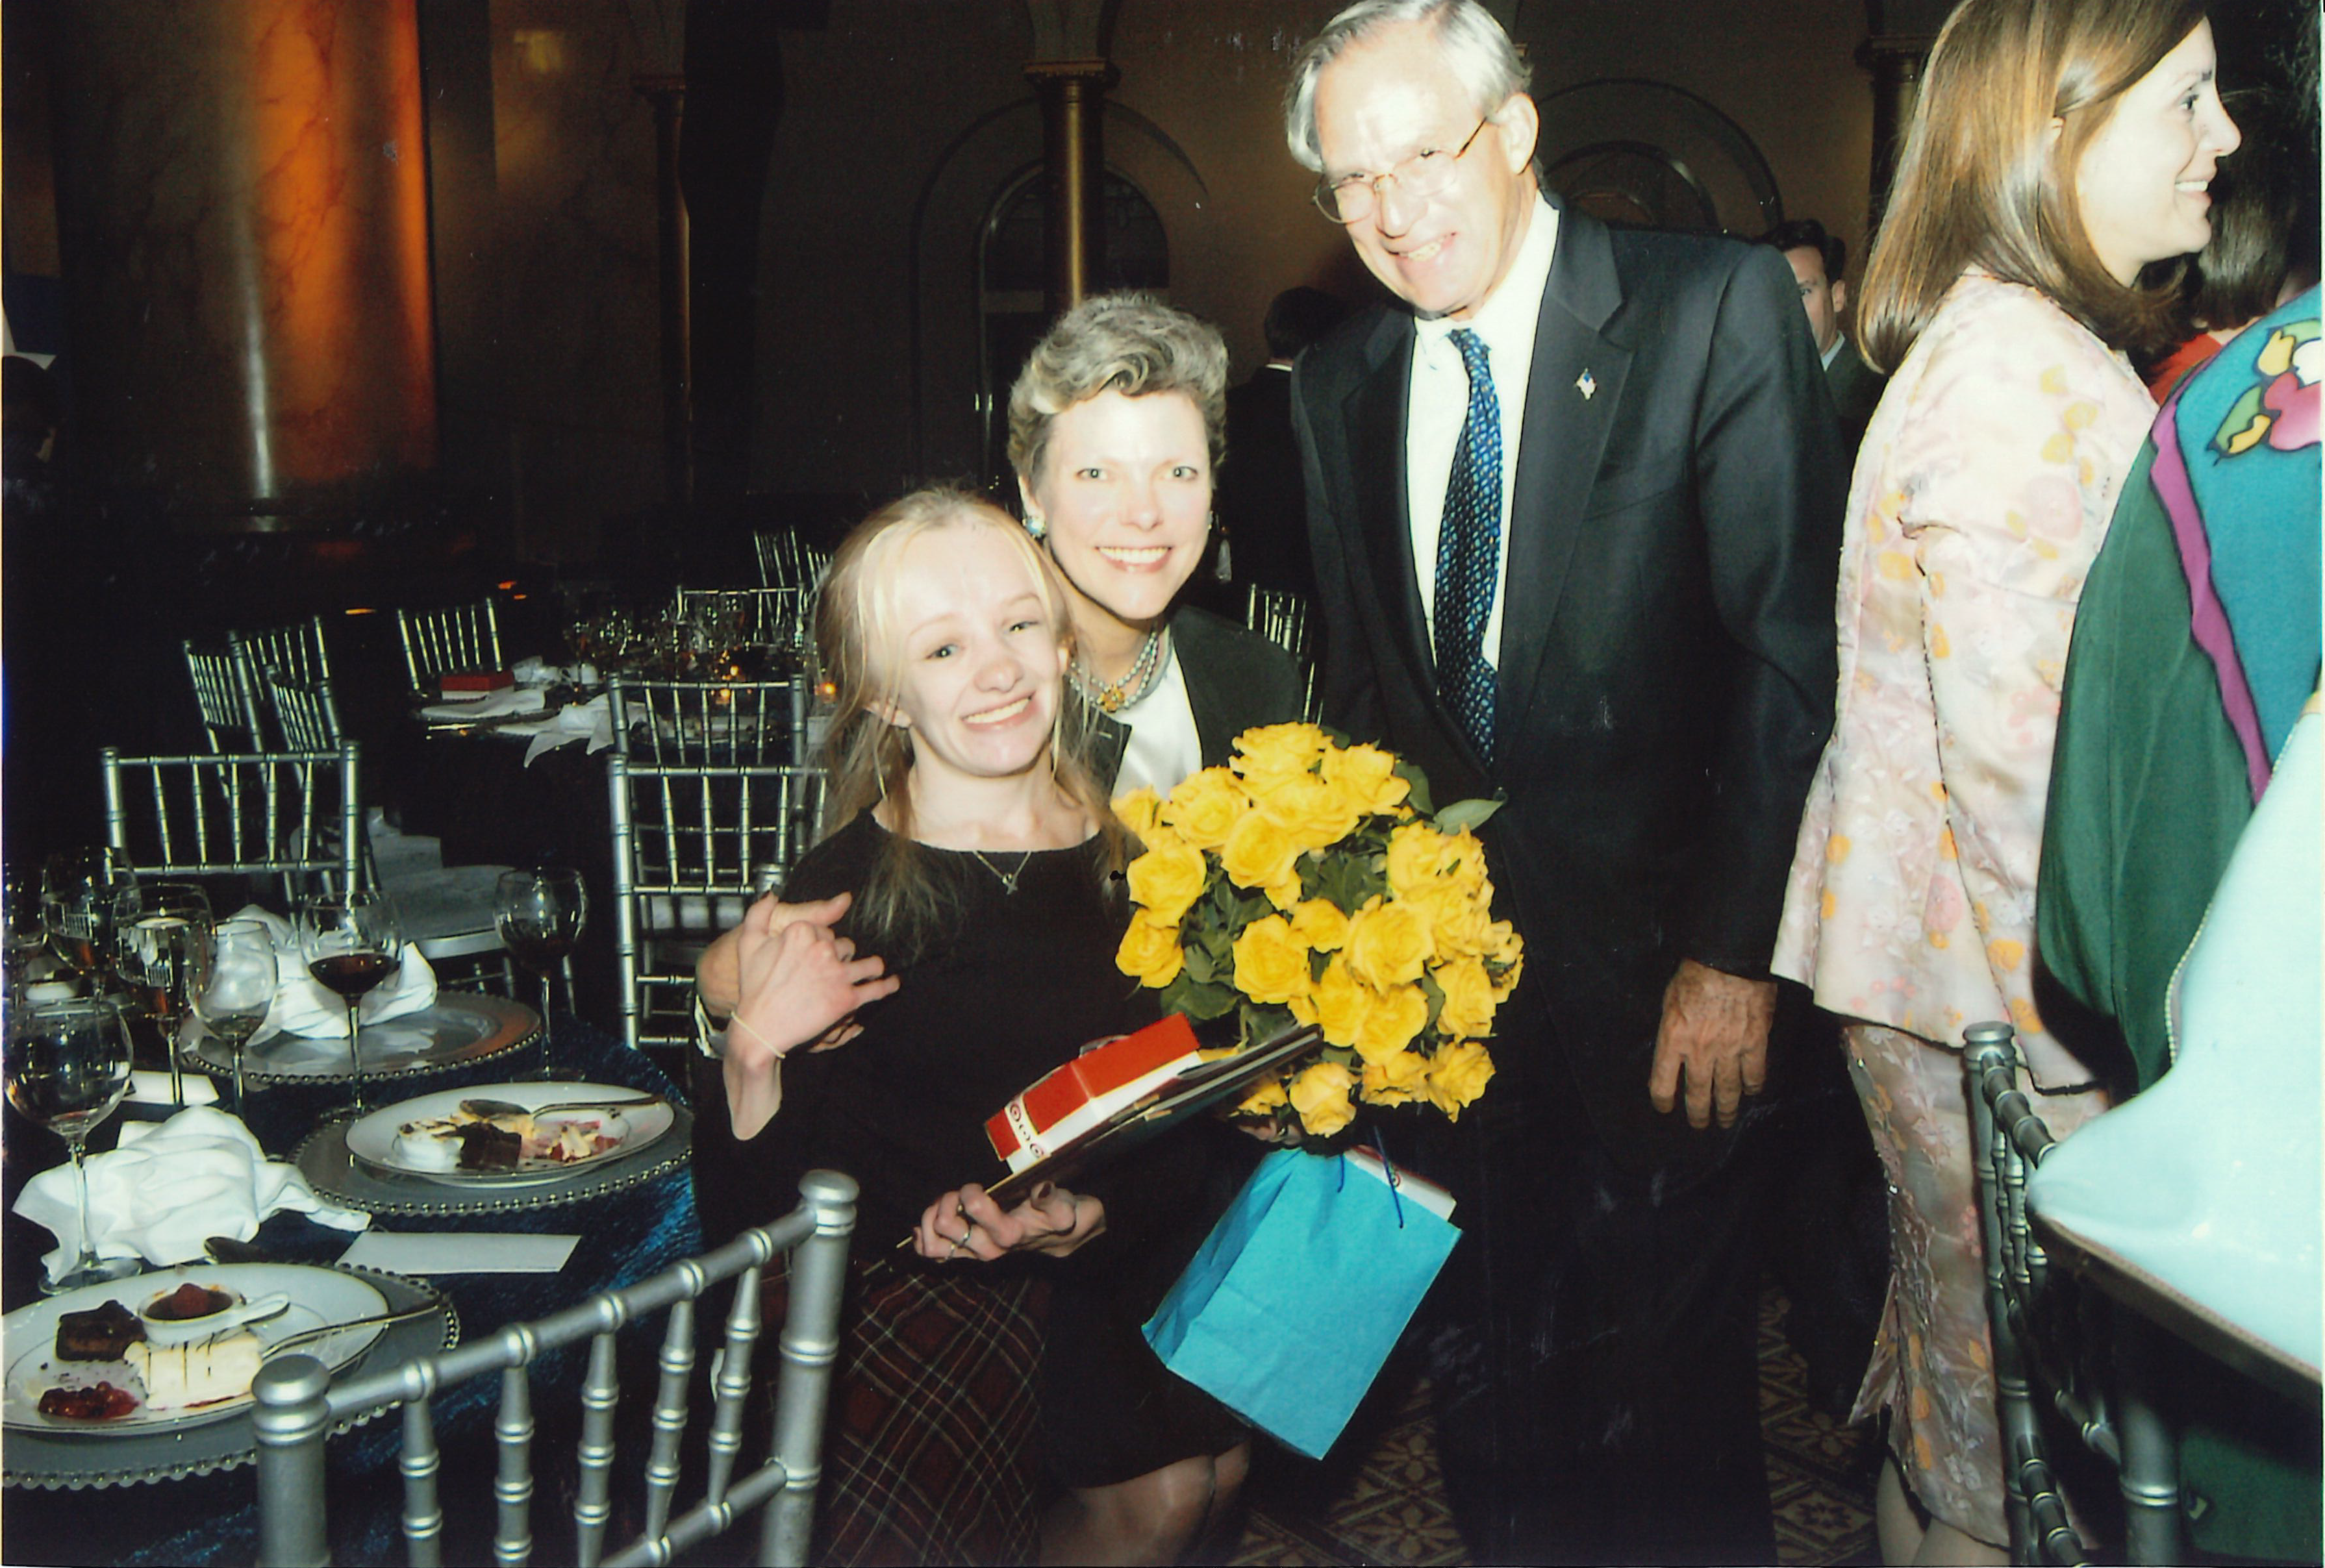 Inn board member Cokie Roberts with a resident at an Inn Gala